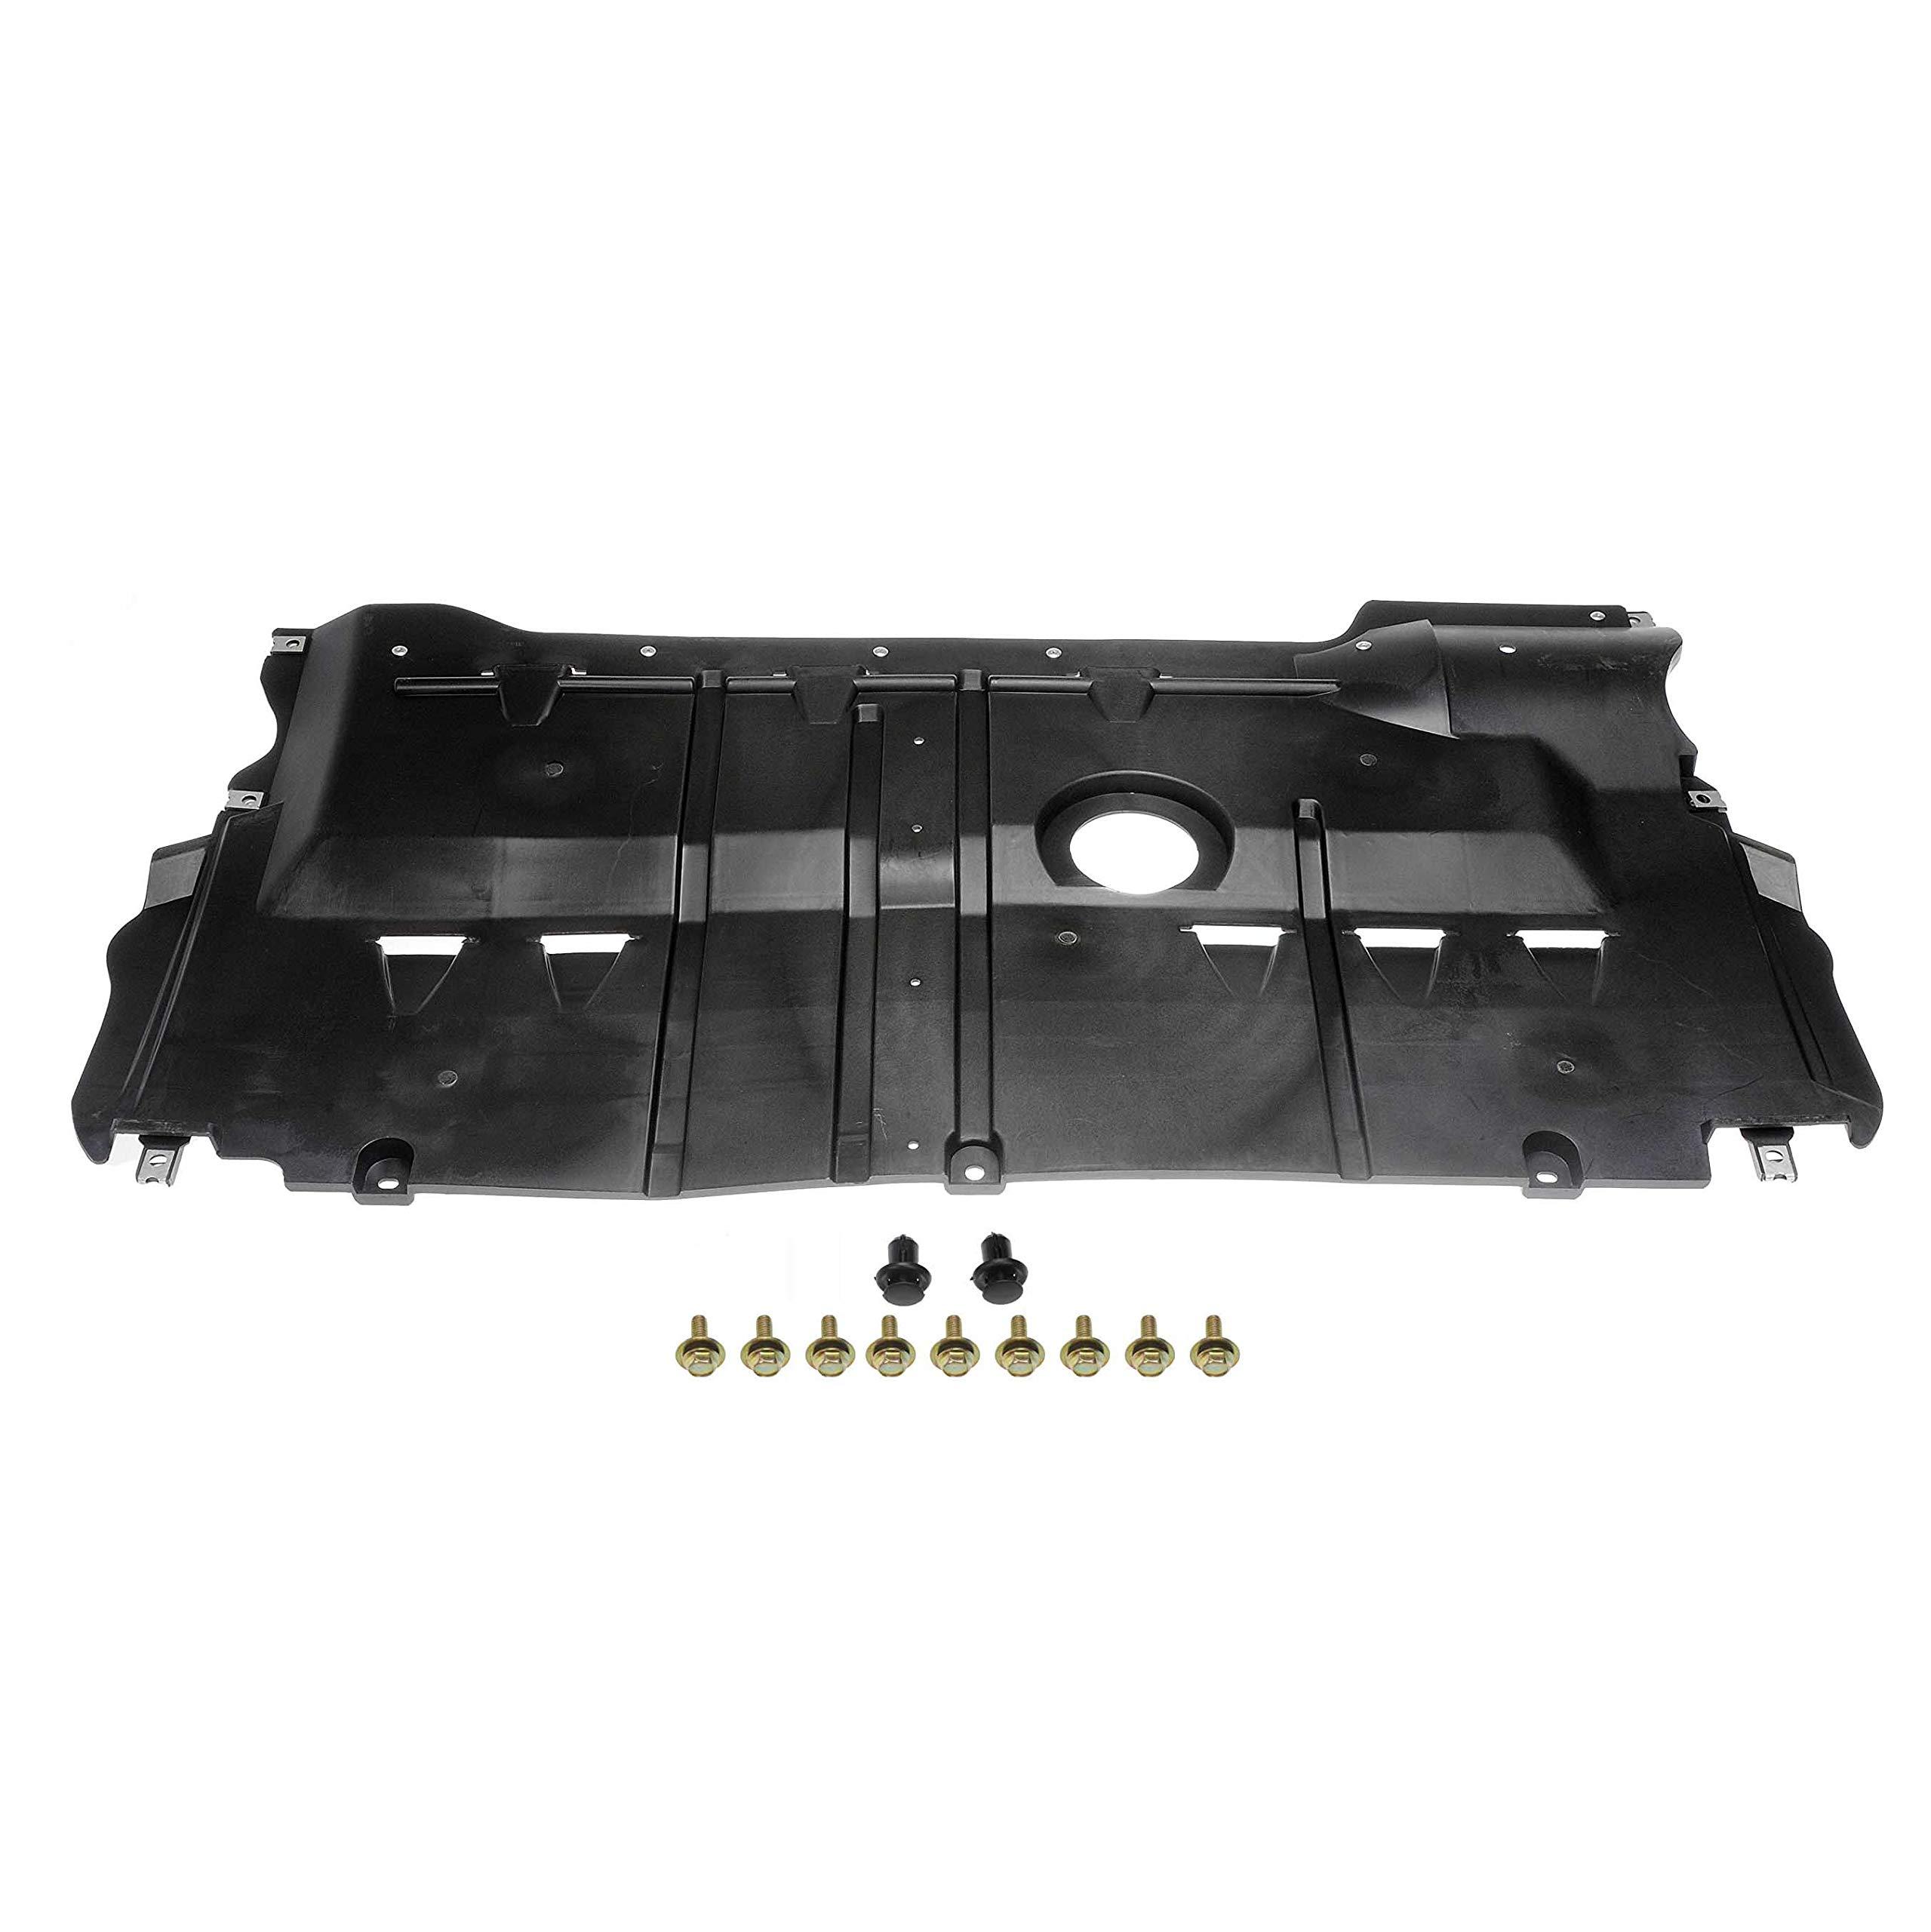 Dorman 924-015 Front Center Lower Undercar Shield for Select Mazda Models